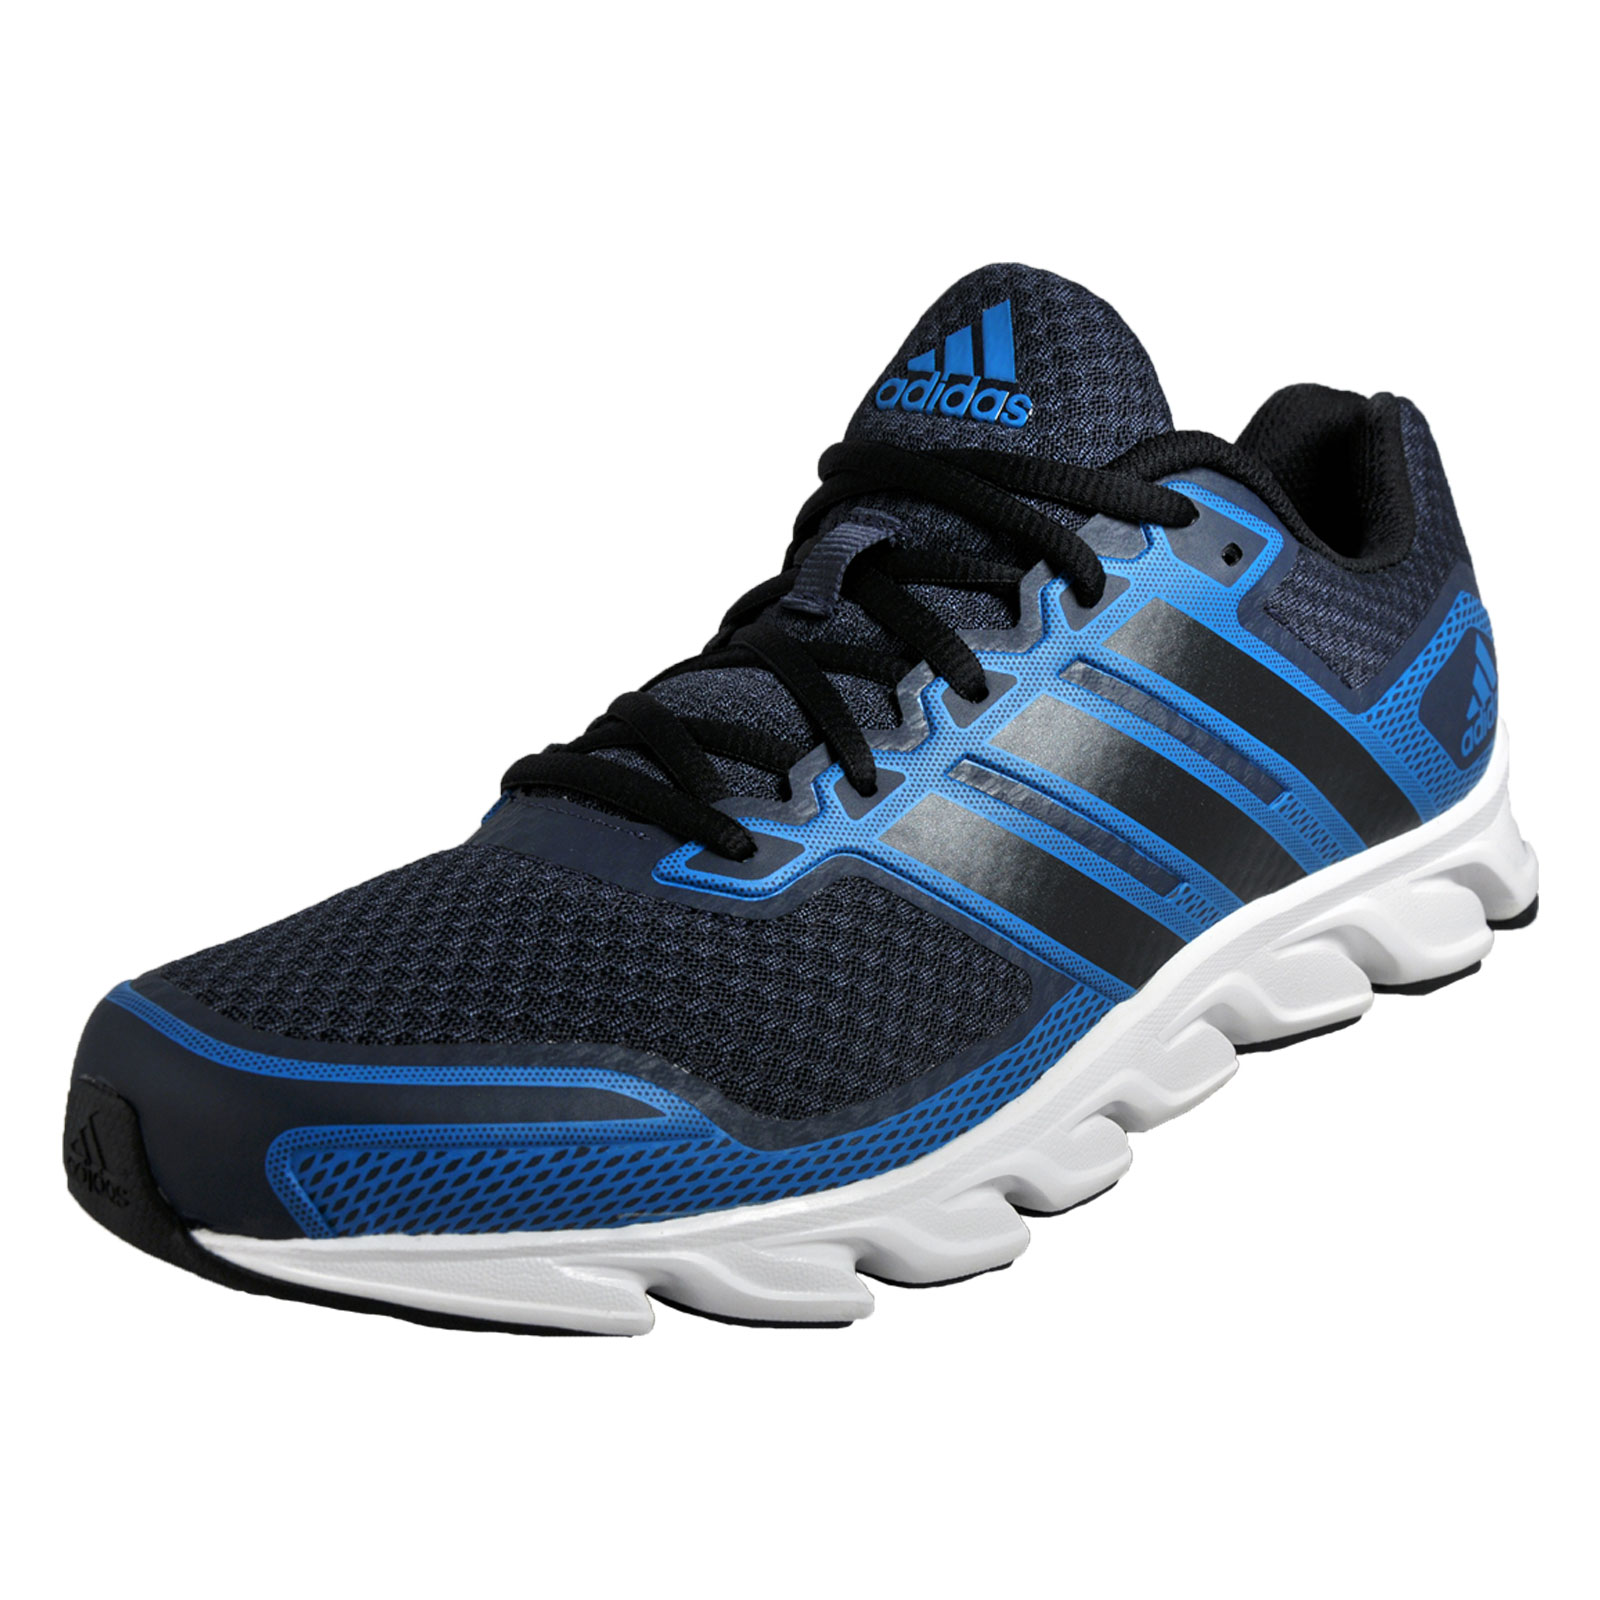 Mens Hard Surface Running Shoes